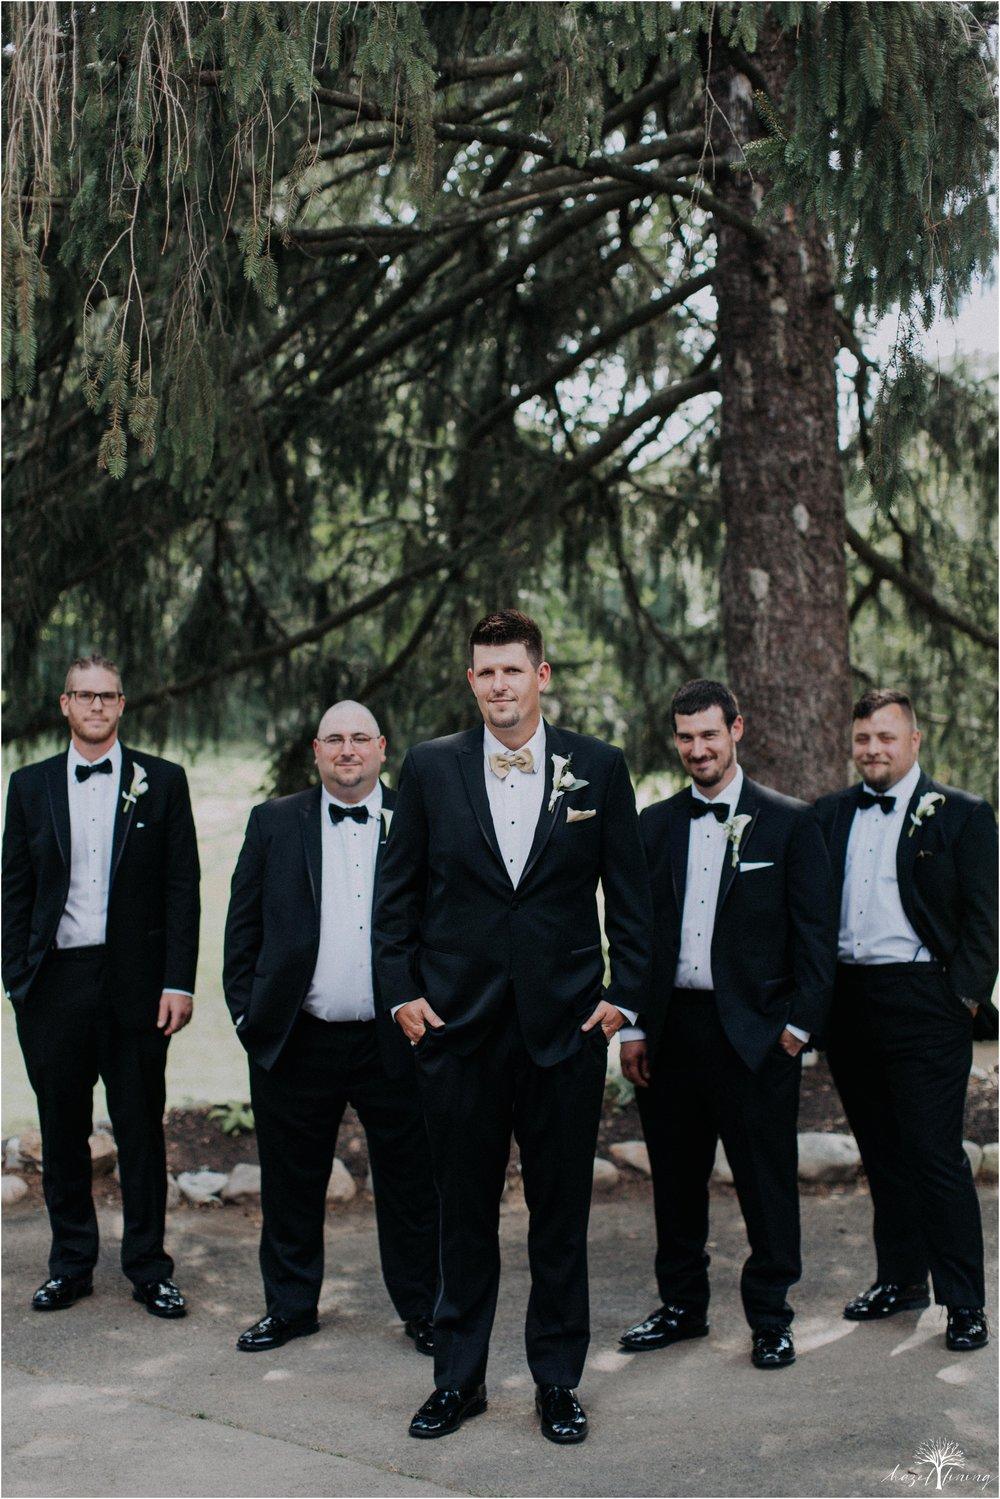 elizabeth-doelp-andrew-foreback-middletown-country-club-summer-langhorne-pennsylvania-wedding-hazel-lining-travel-wedding-elopement-photography_0072.jpg